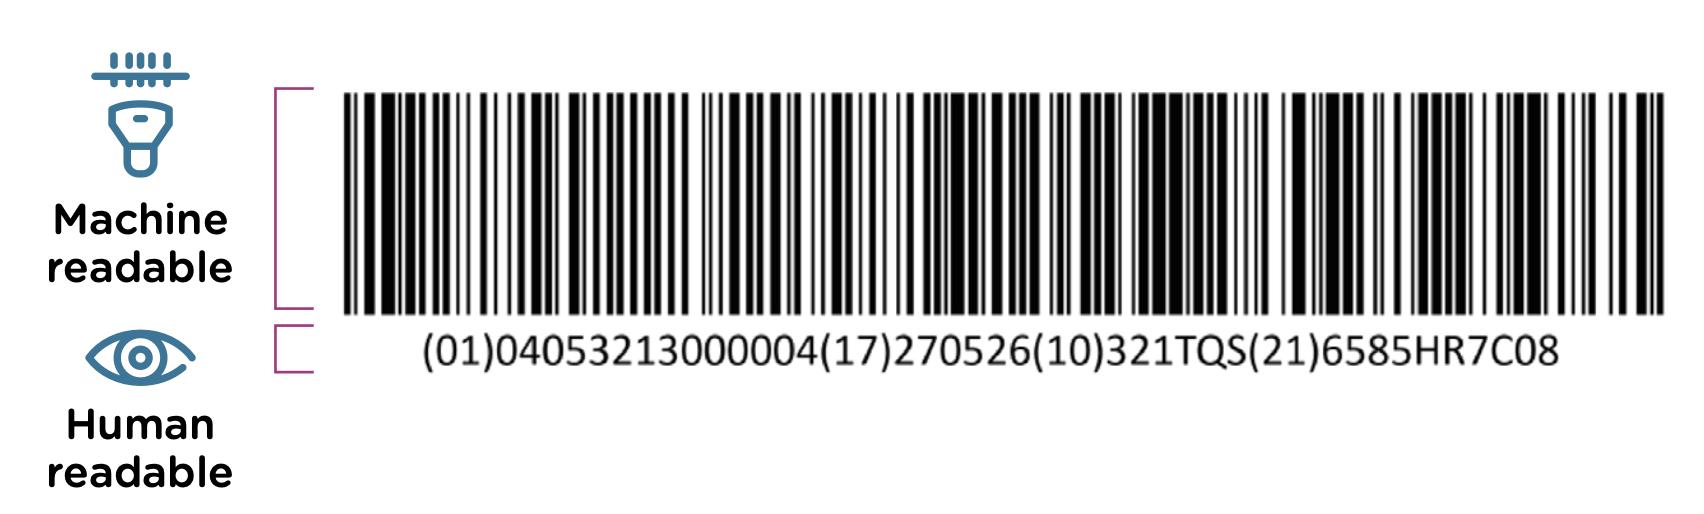 UDI Code Components